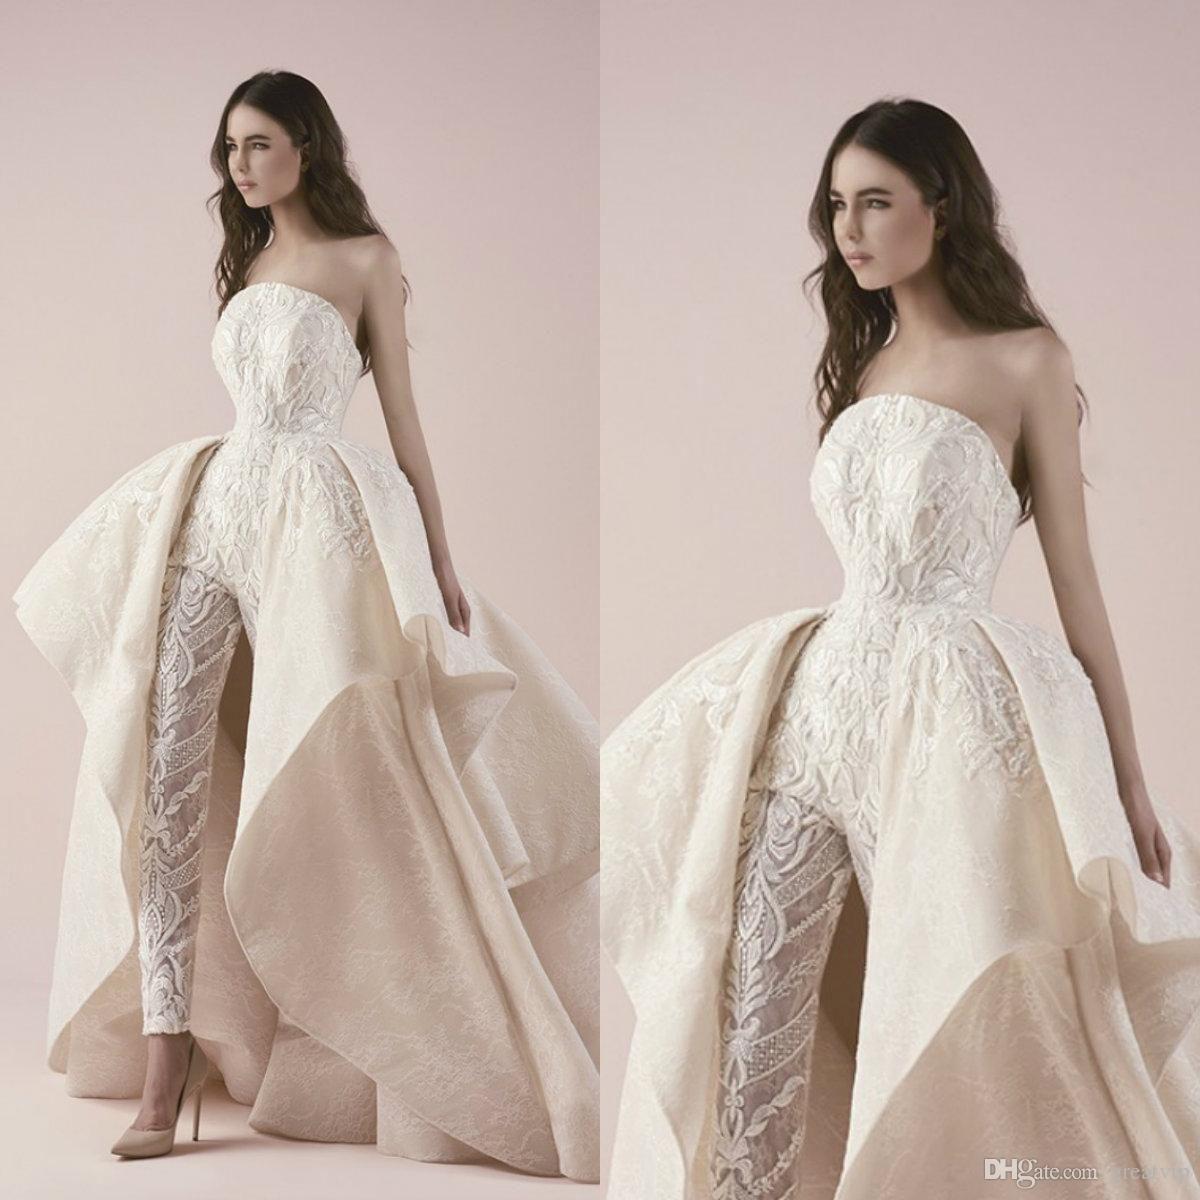 Discount Elegant Overskirts Jumpsuits Wedding Dresses 2019